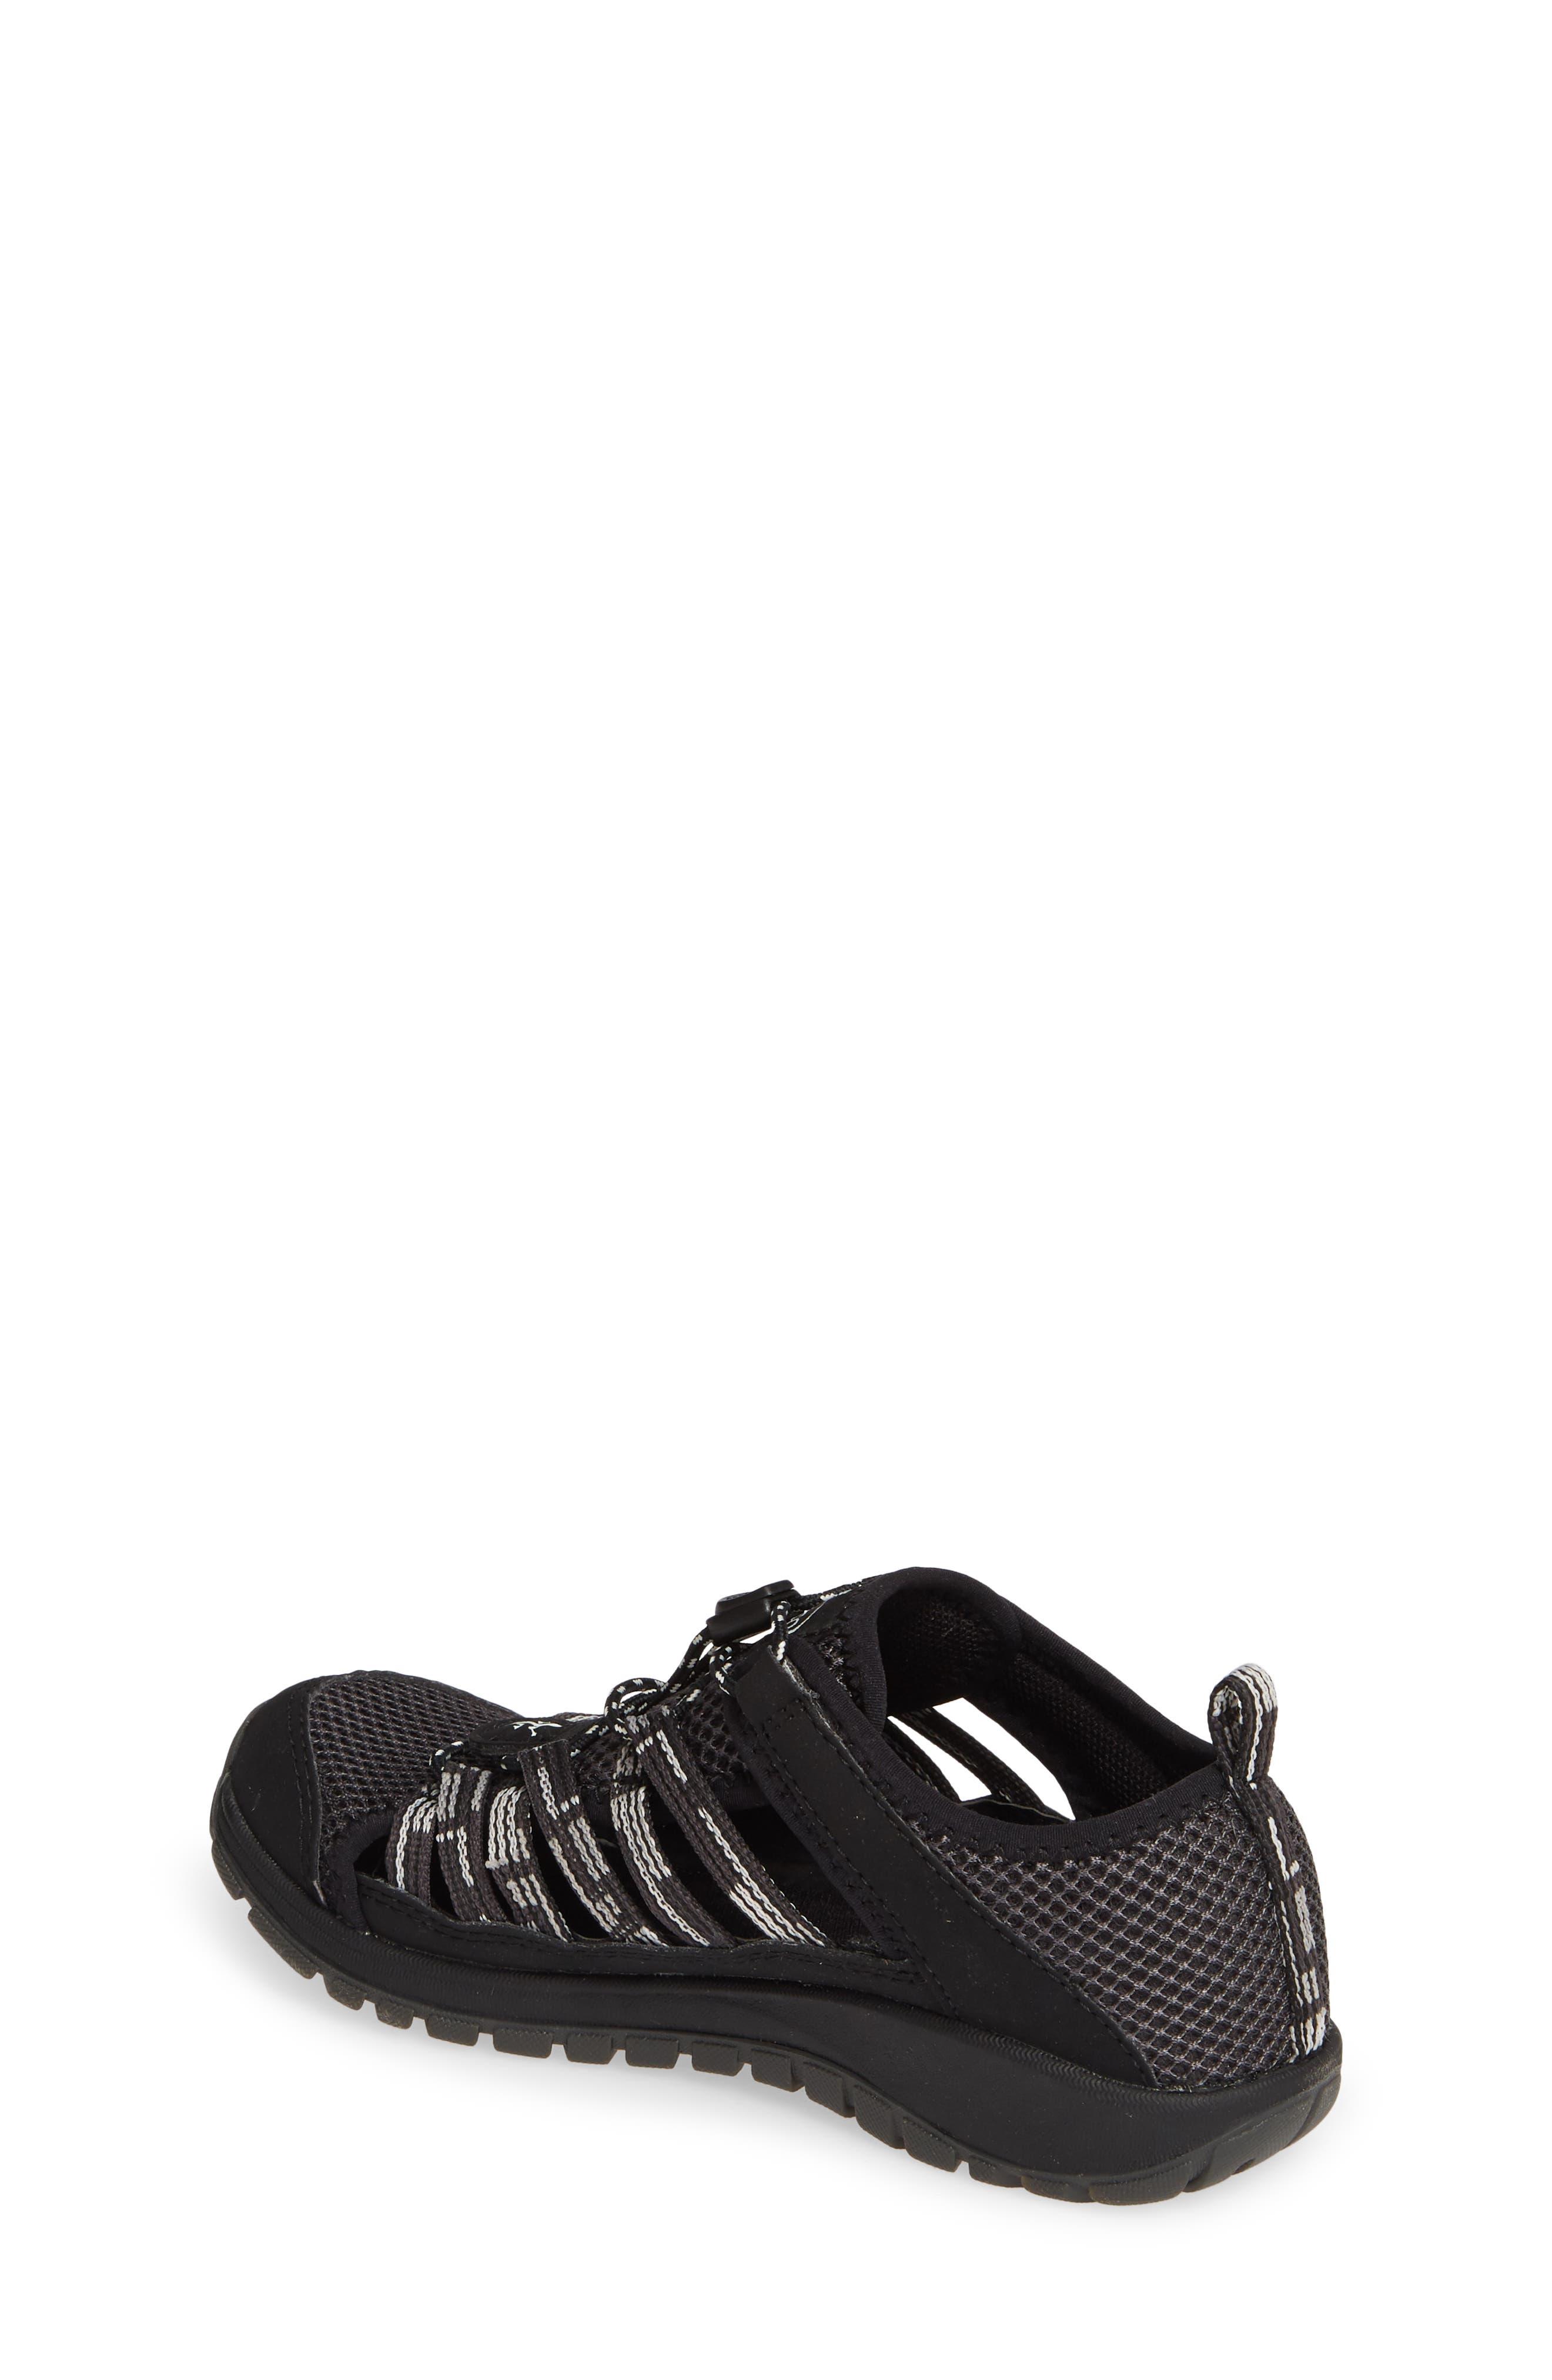 CHACO, Outcross 2 Water Sneaker, Alternate thumbnail 2, color, PAVEMENT BLACK